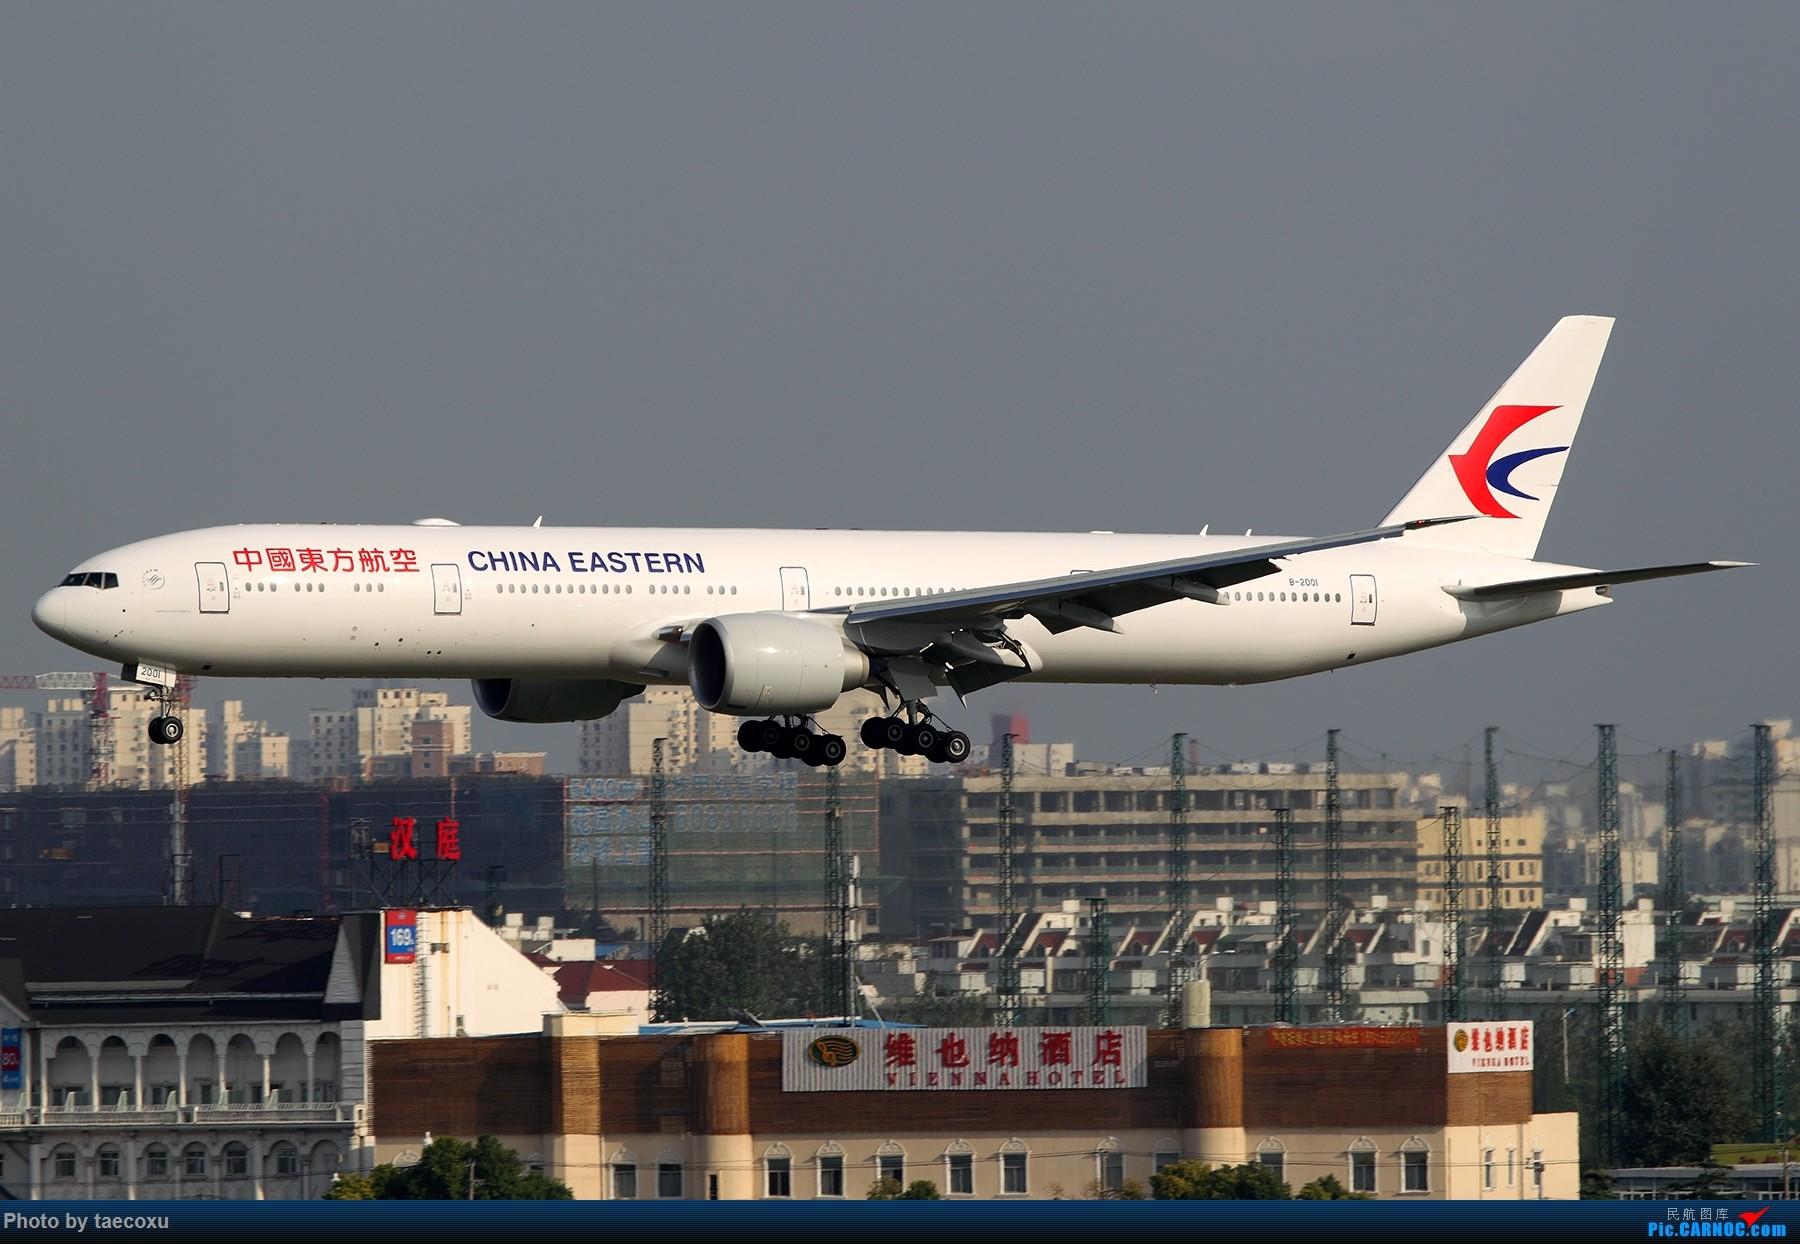 Re:[原创]据说能发大图了 BOEING 777-300ER B-2001 中国上海虹桥国际机场